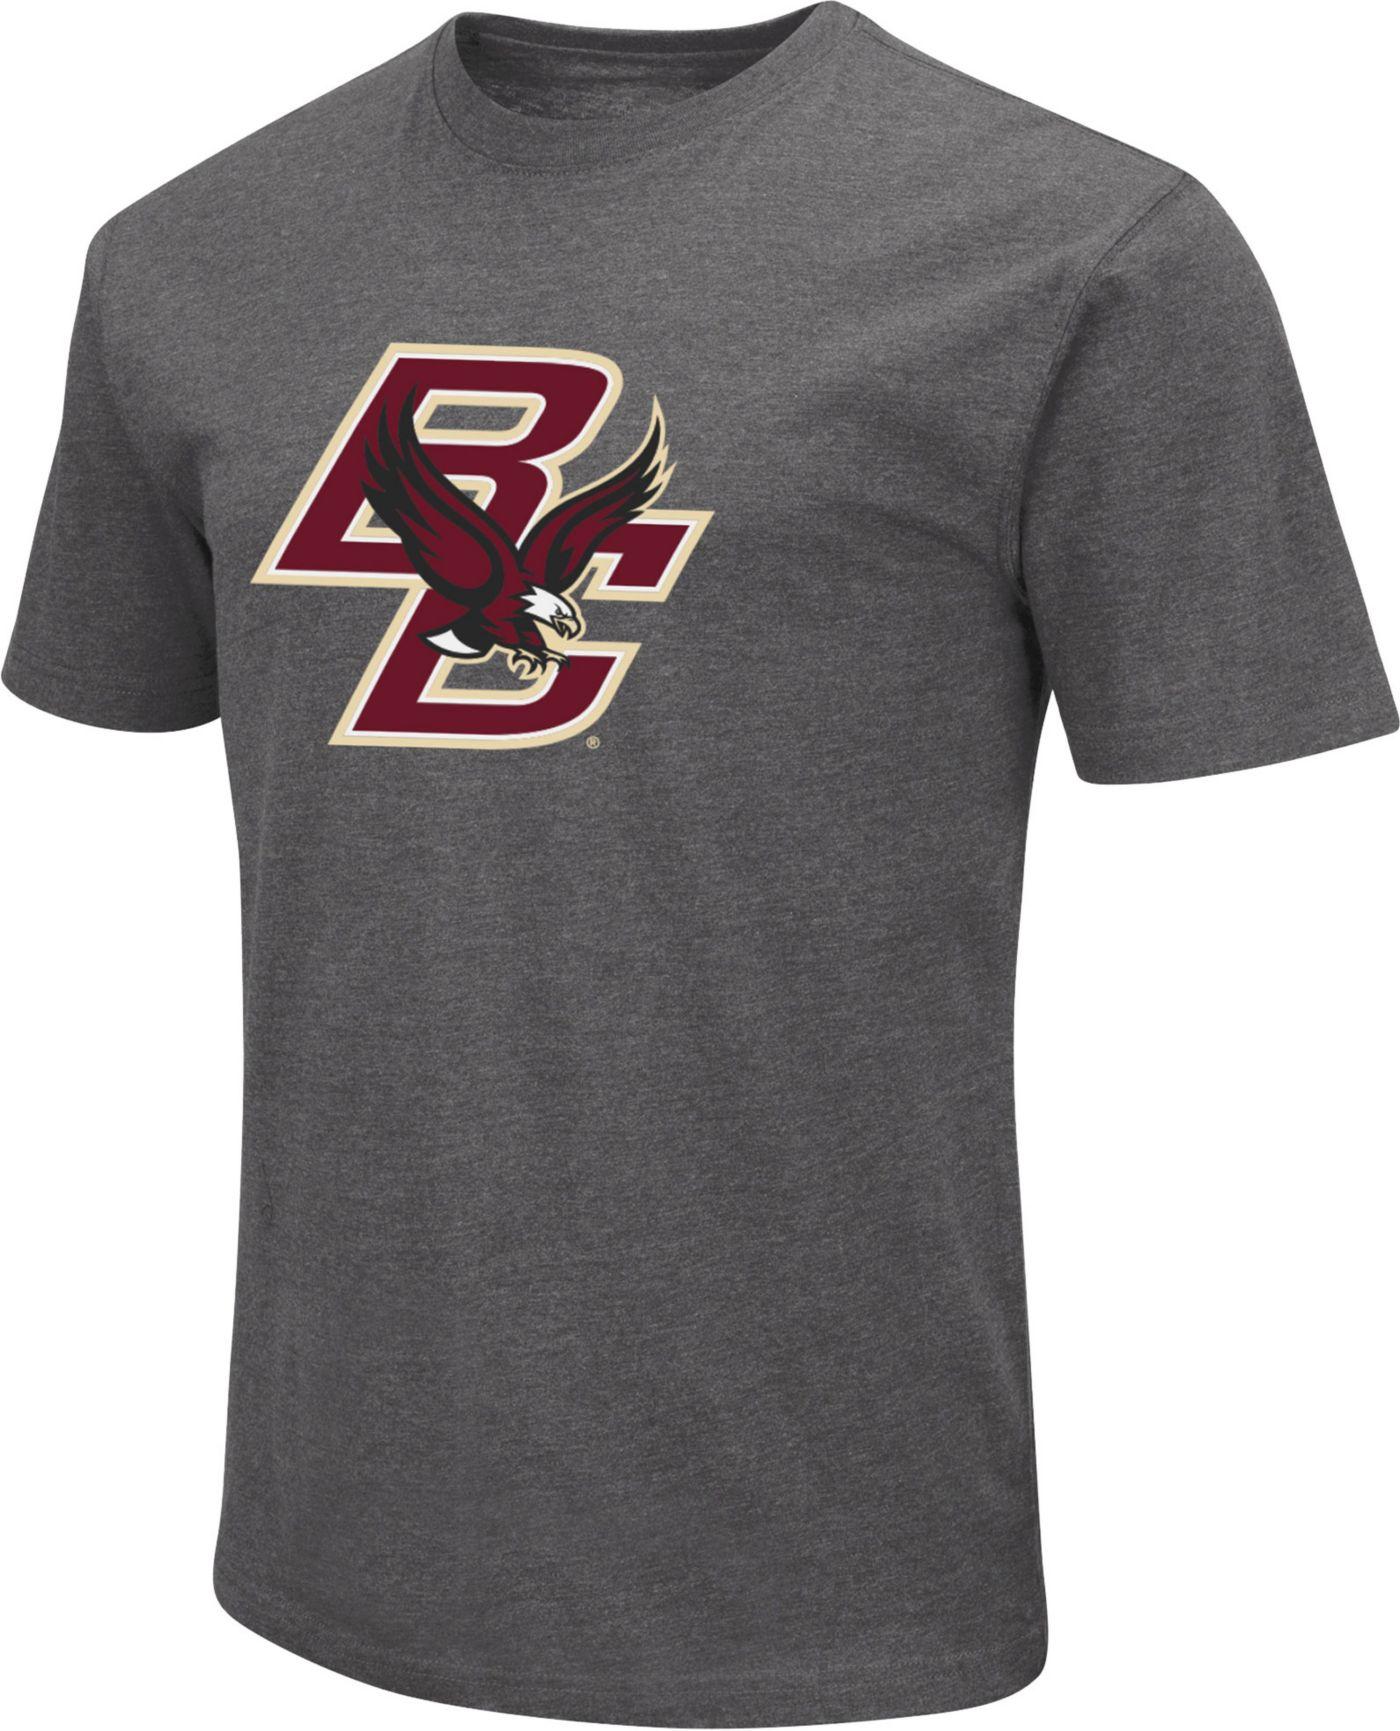 Colosseum Men's Boston College Eagles Grey Dual Blend T-Shirt